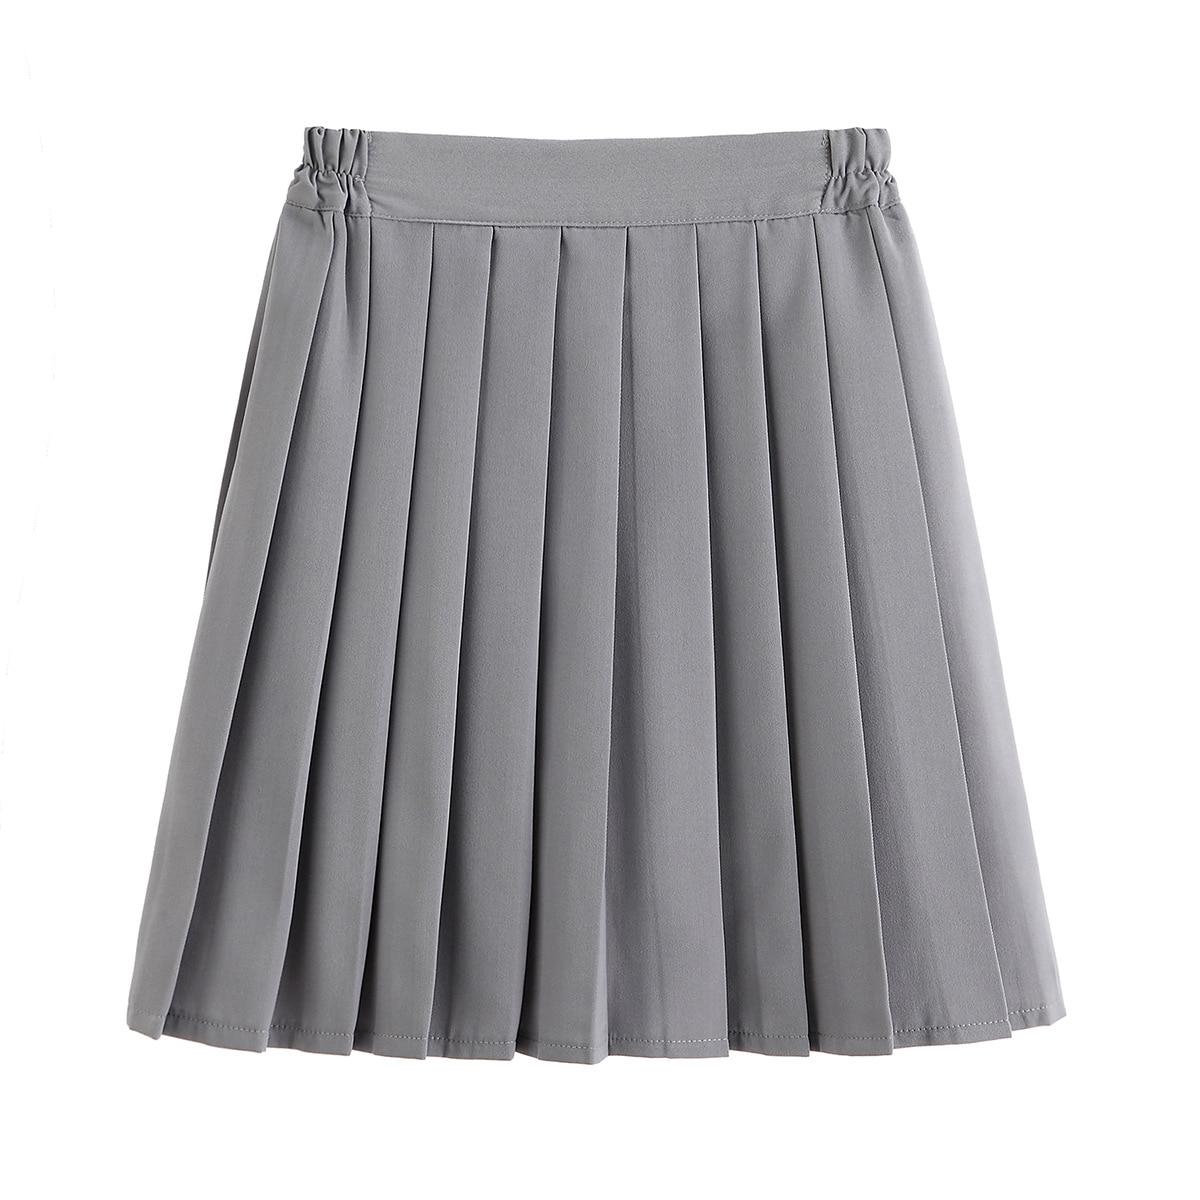 JK Uniform Skirt Autumn New Japanese College Style Middle School Student Class Service Elastic Waist Gray Pleated Skirt